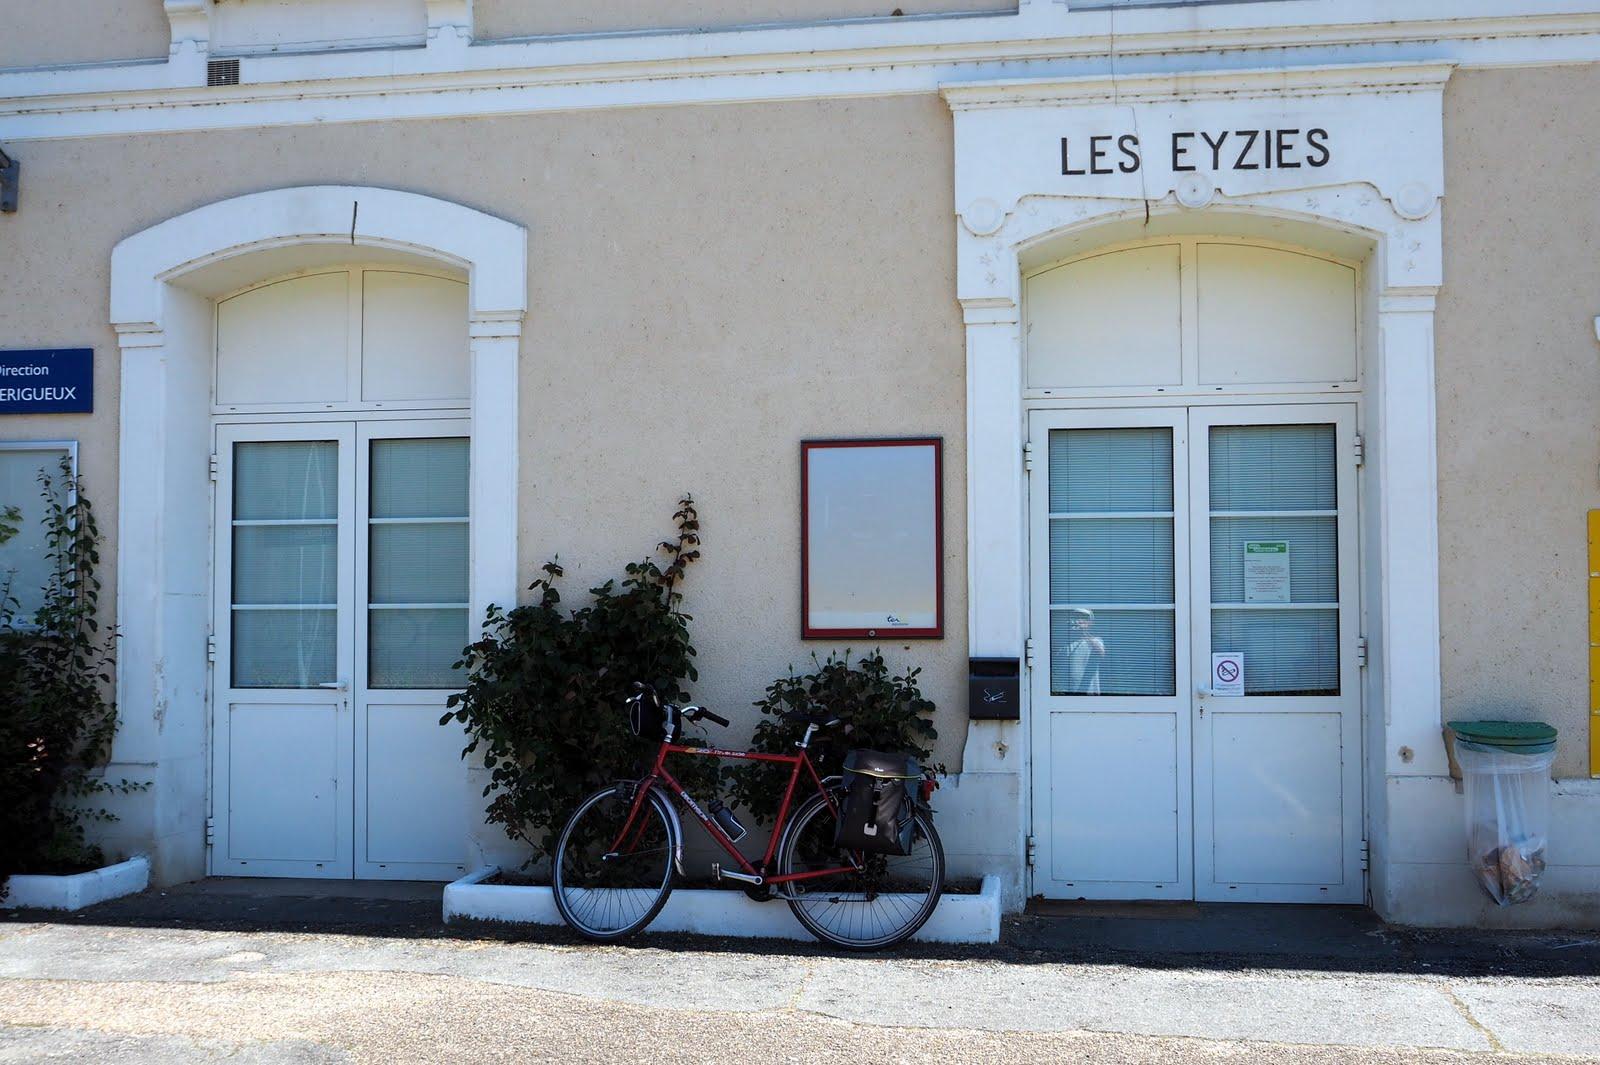 Gare Les Eyzies ©Escapade Nature